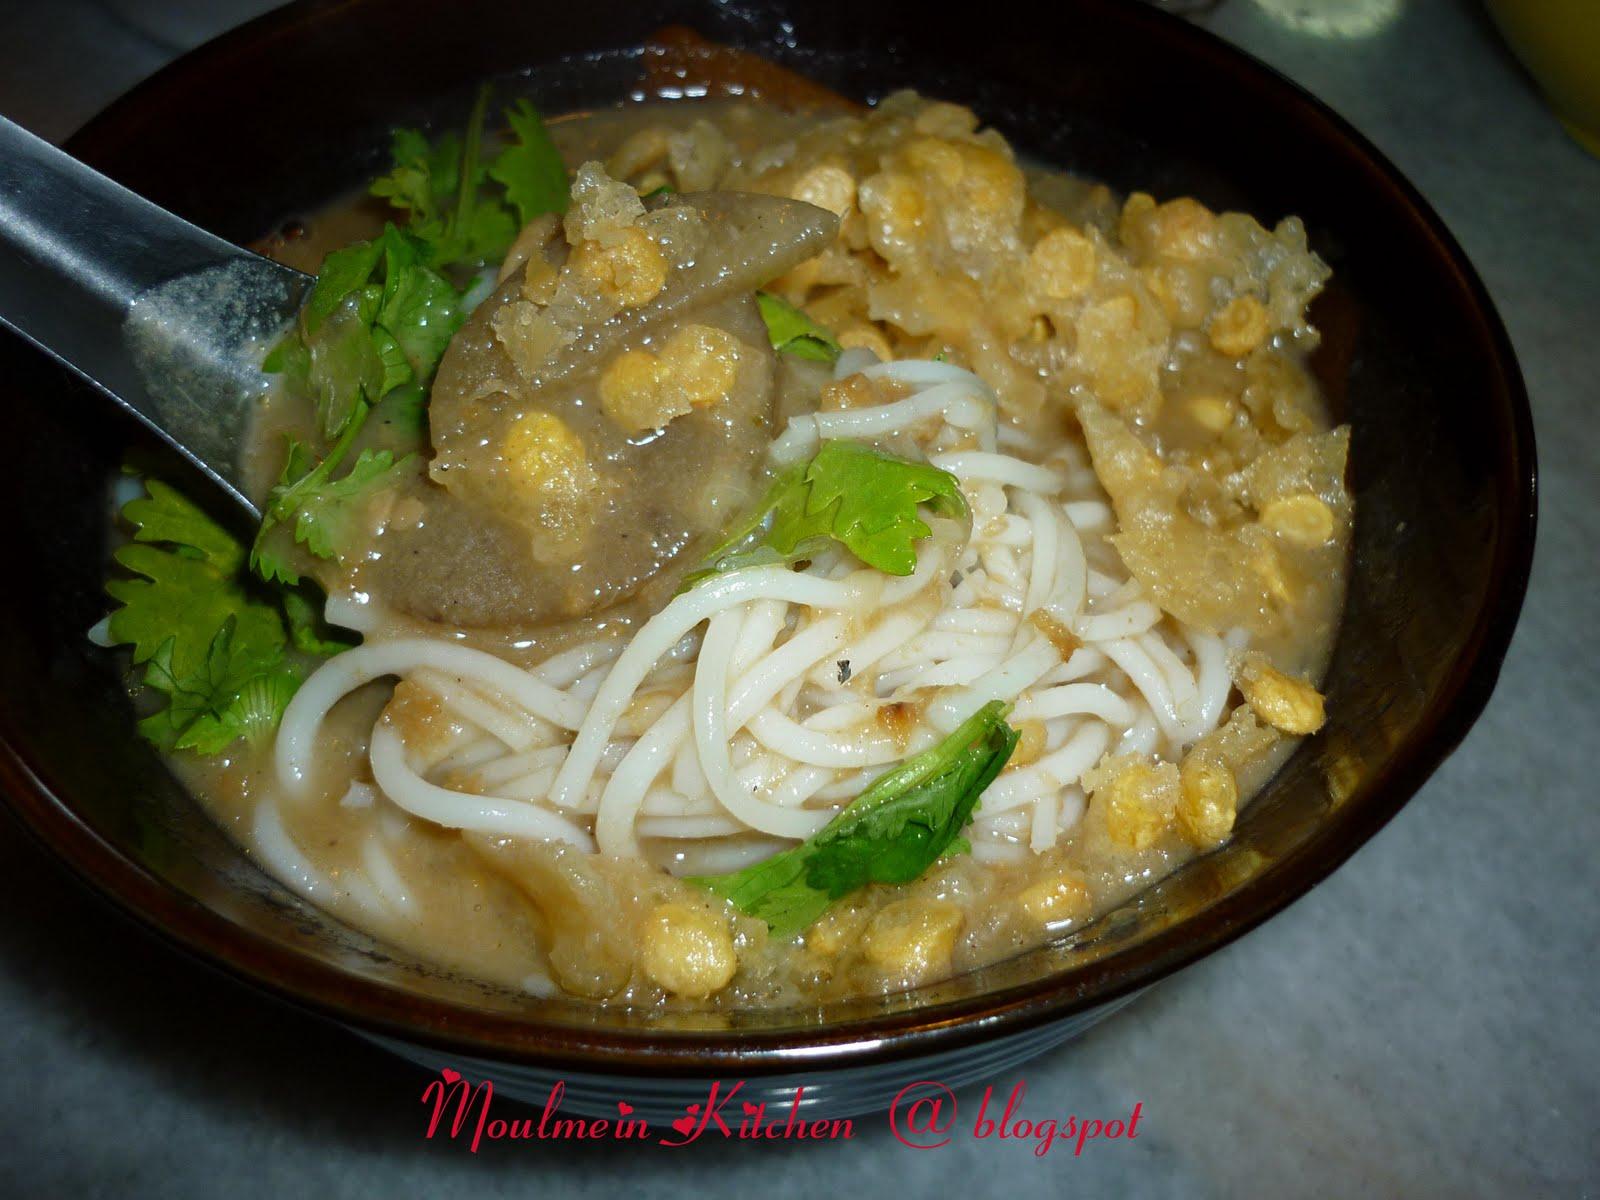 Moulmein Kitchen: Burmese classic breakfast - Moh hin gha